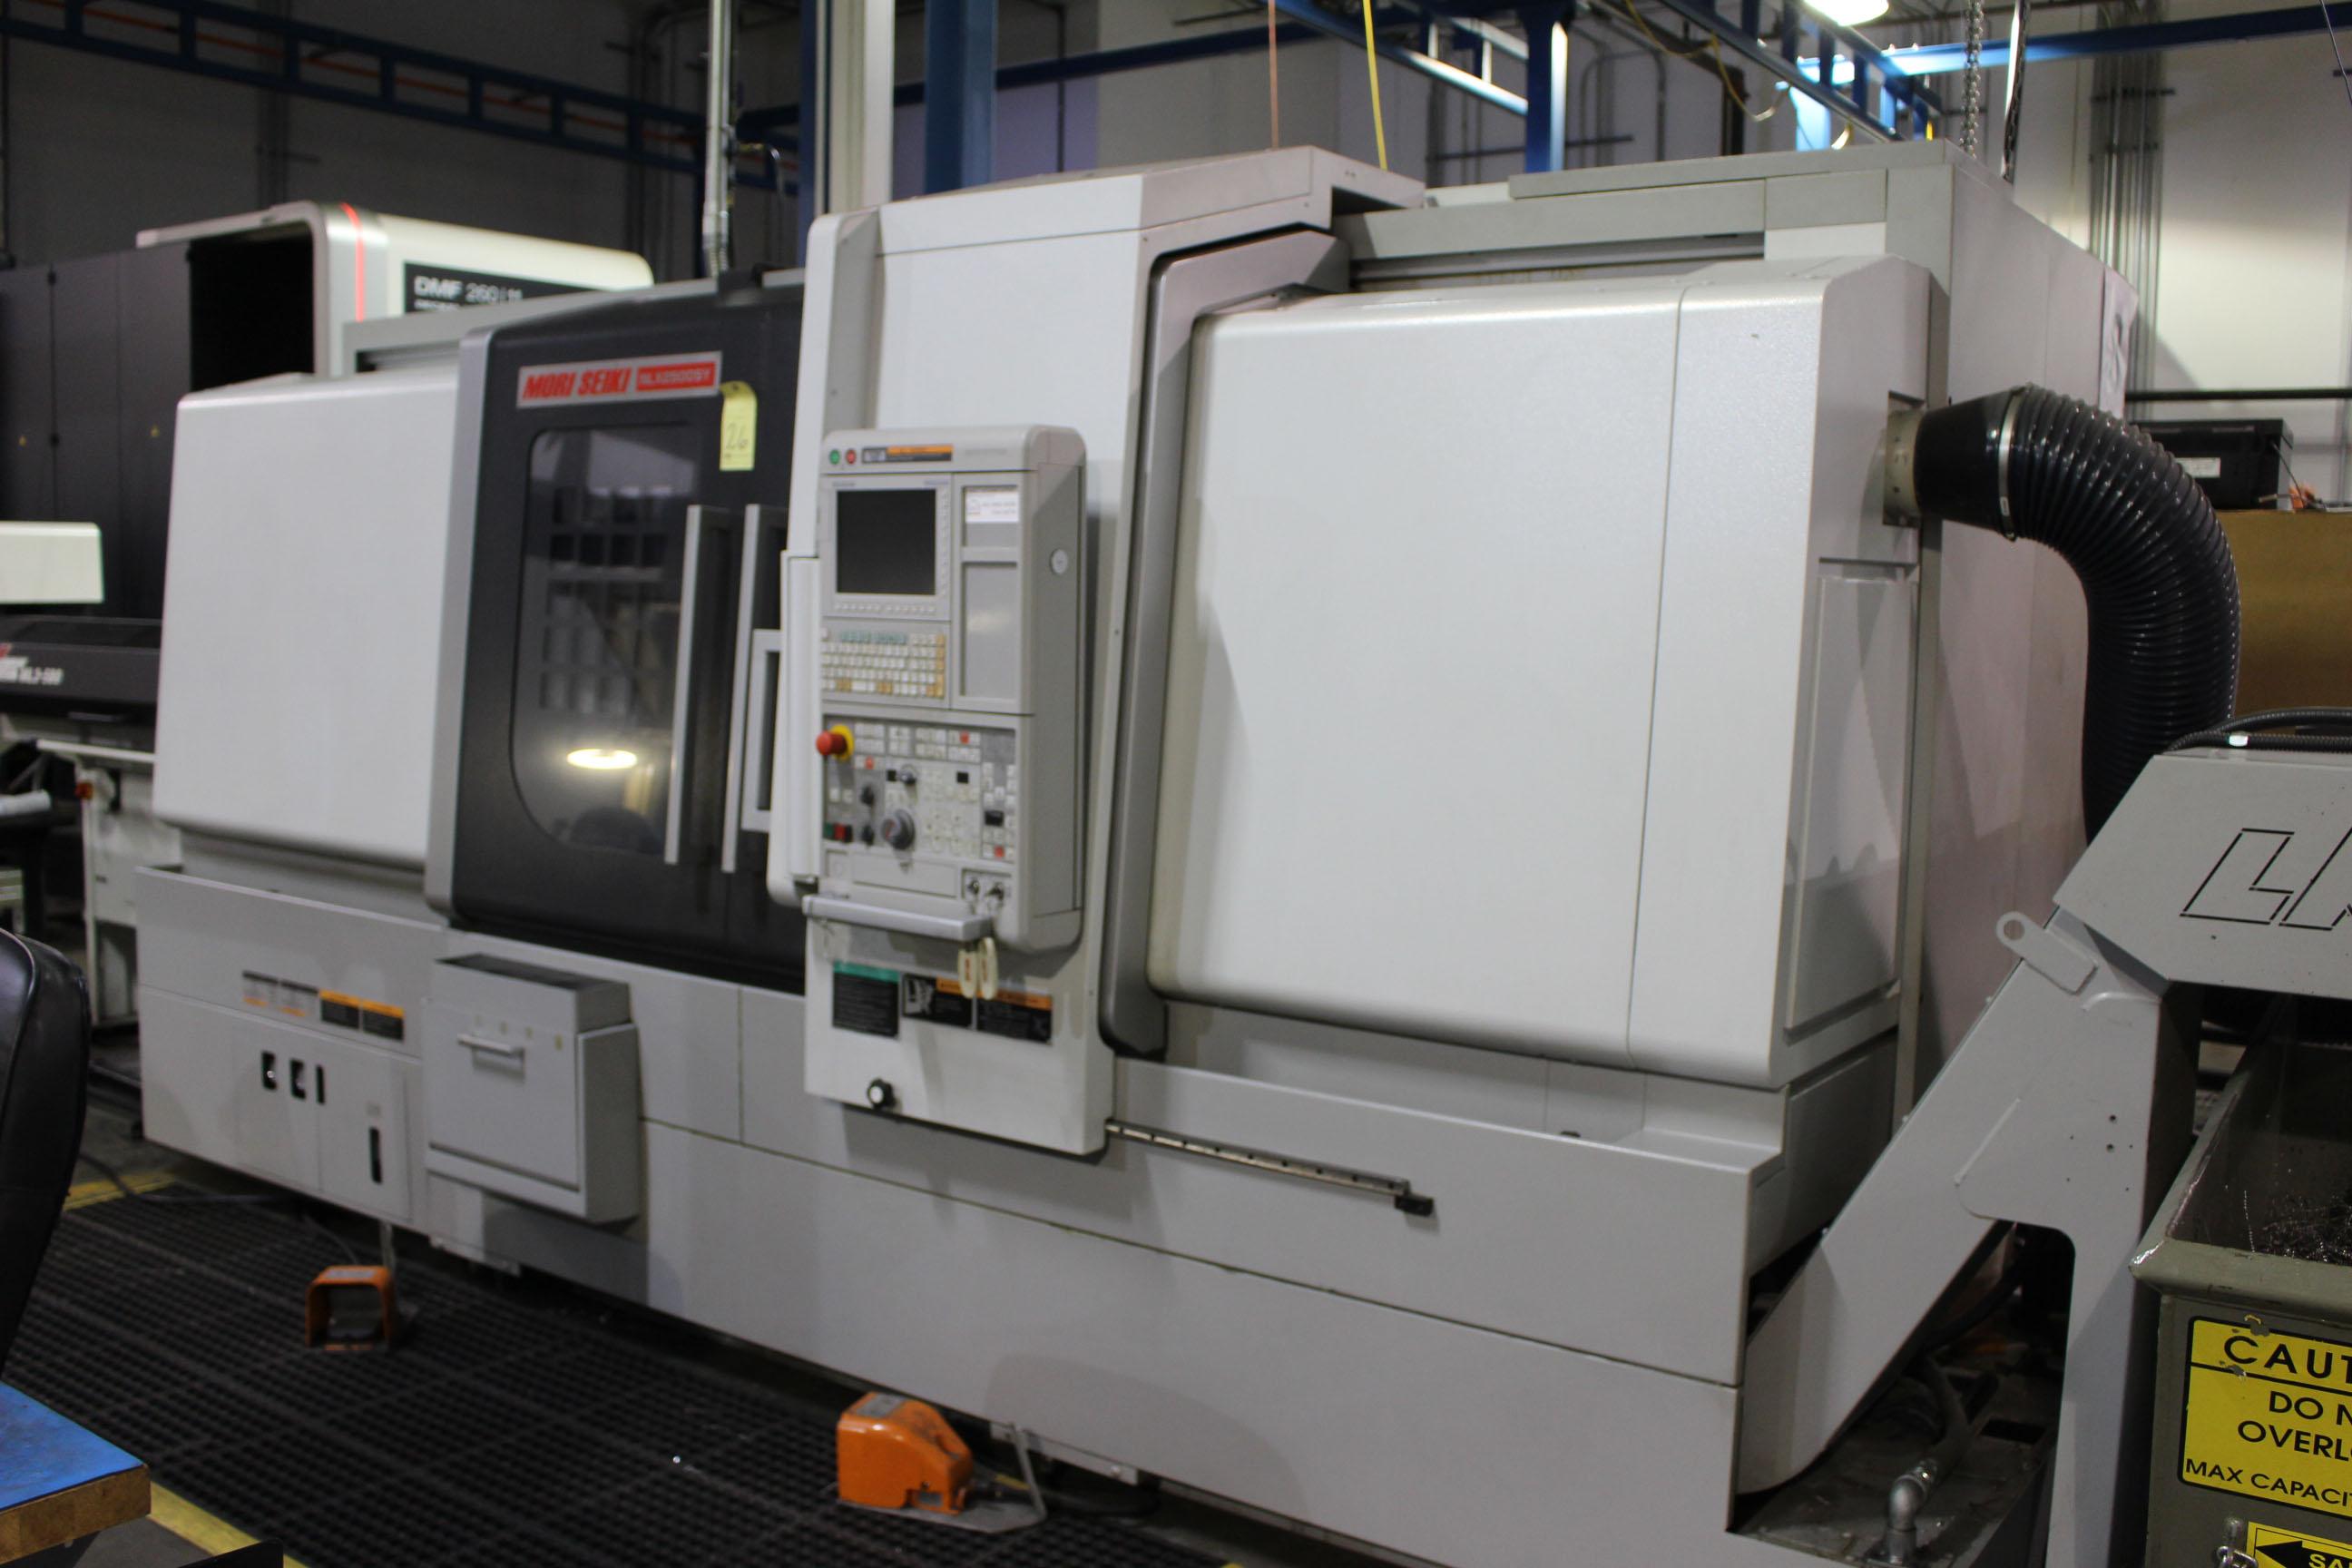 Lot 26 - CNC LATHE, MORI SEIKI MULTI-AXIS MDL. NLX2500SY/1250, new 10/2012, Mori Seiki M730BM CNC control,